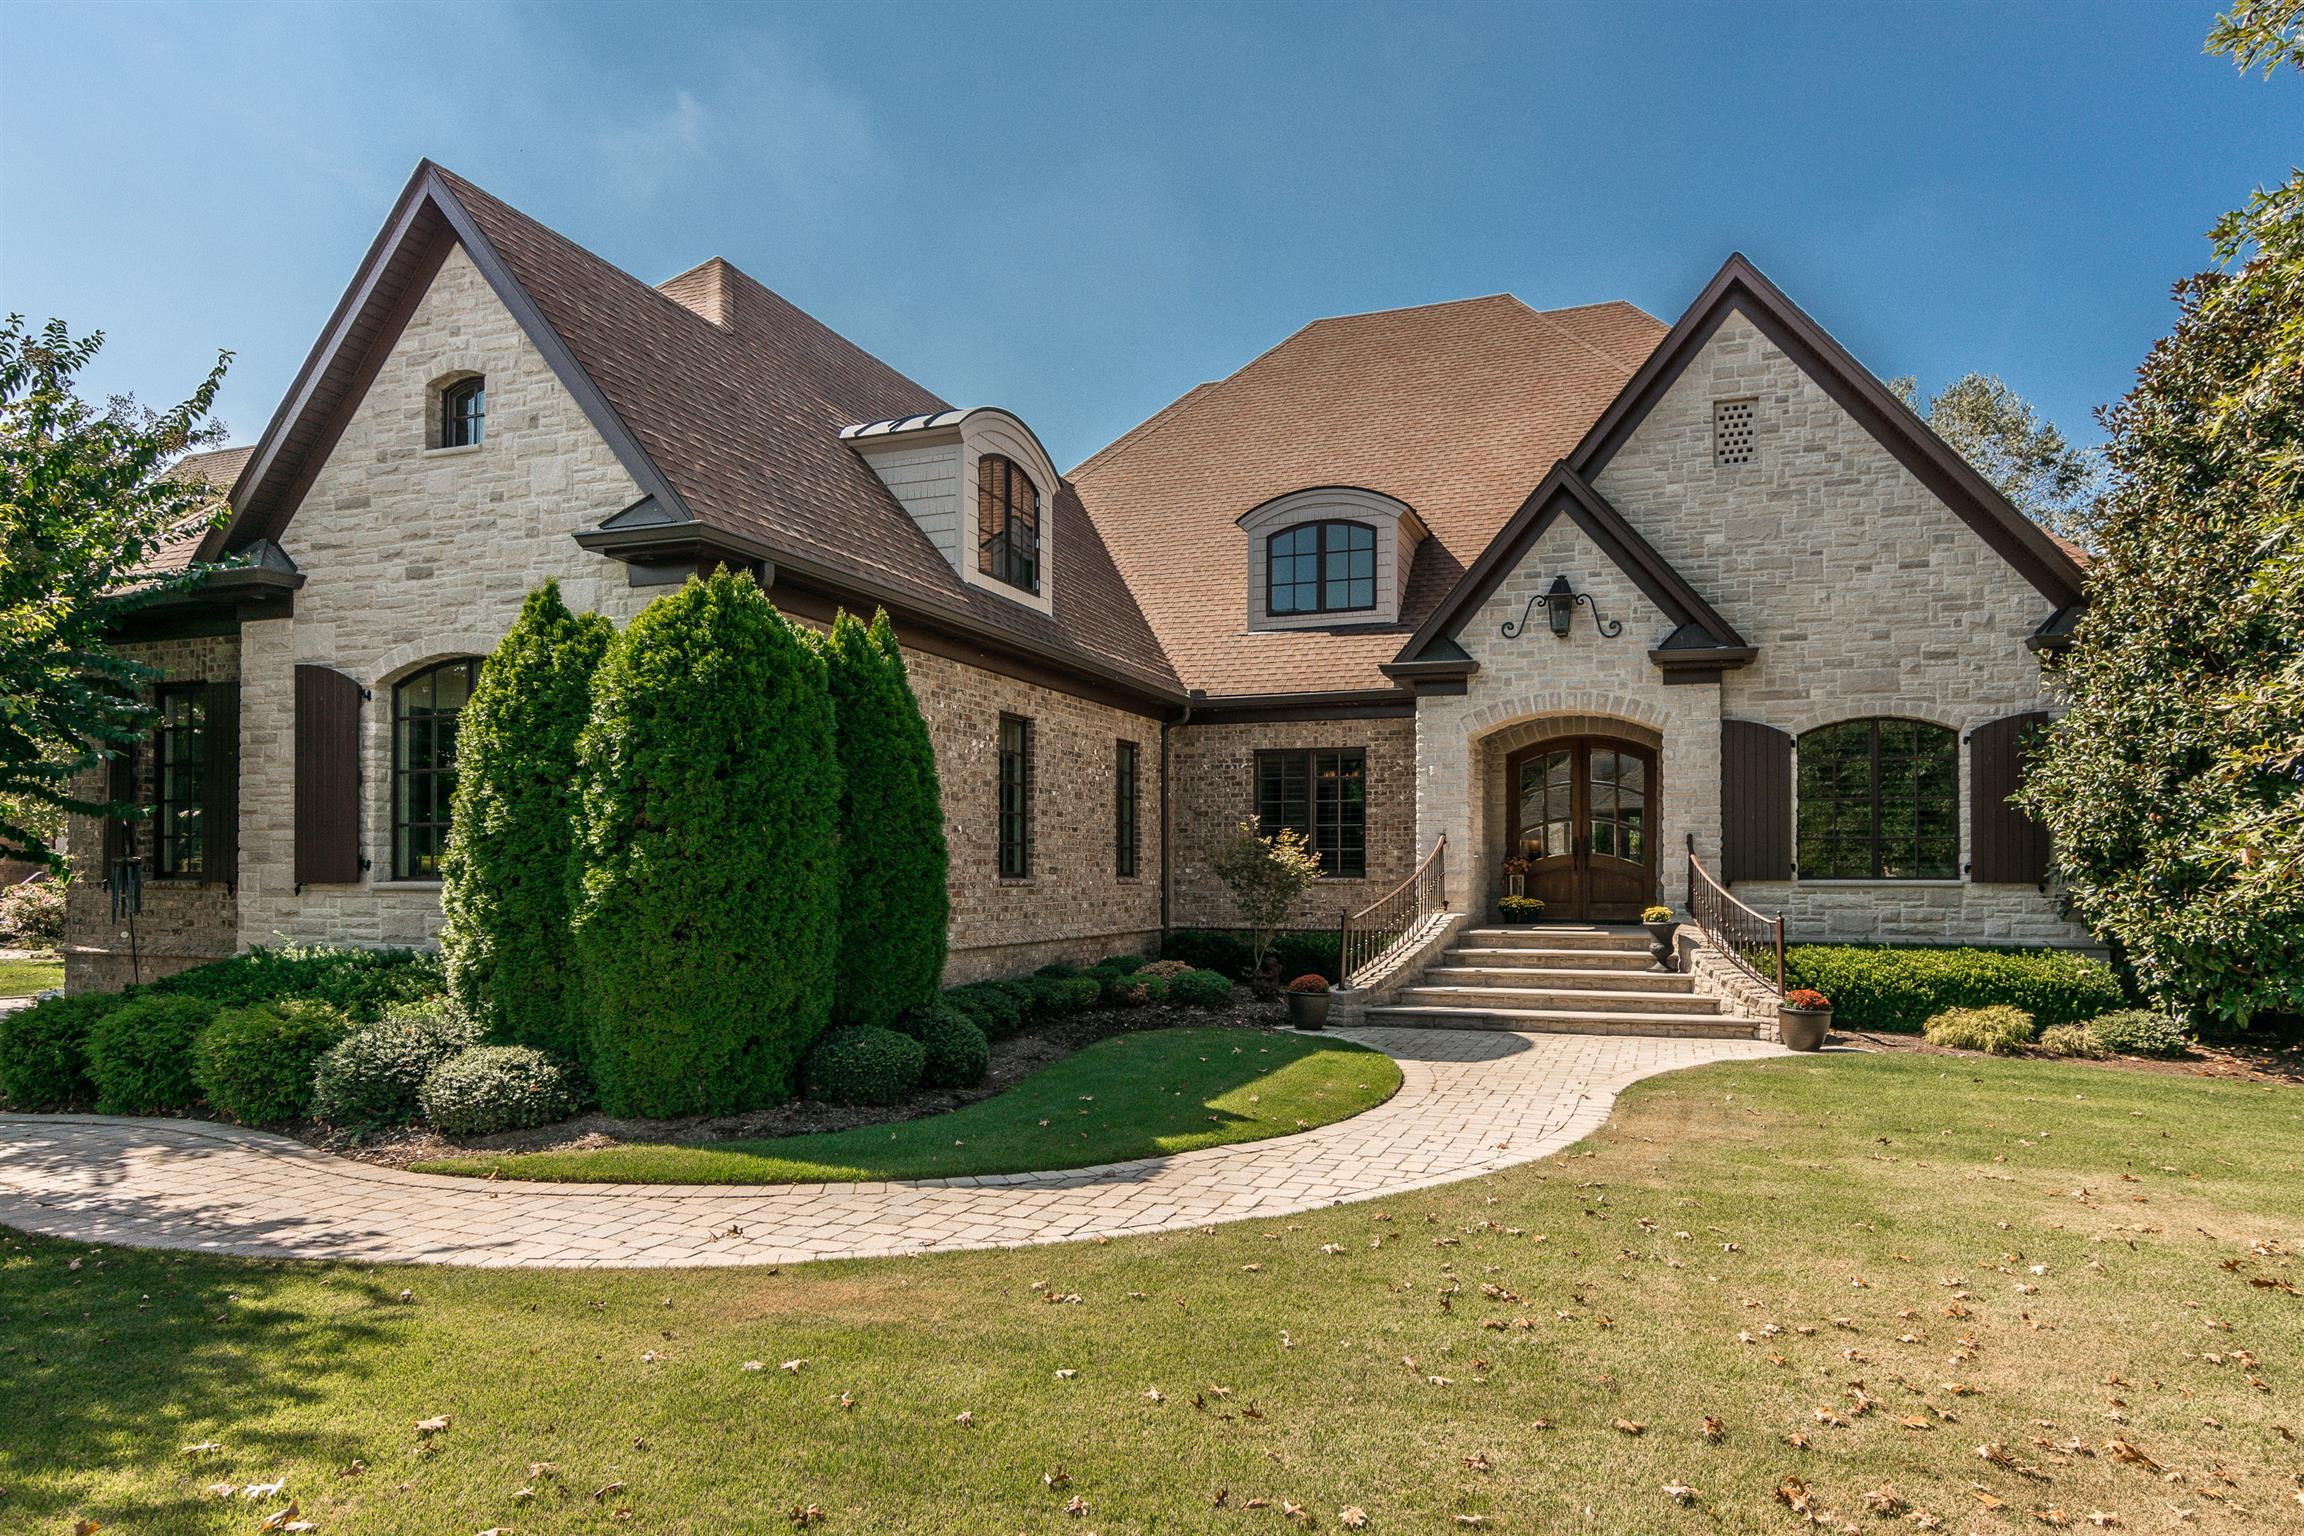 915 John Armfield Ct, Gallatin, TN 37066 - Gallatin, TN real estate listing